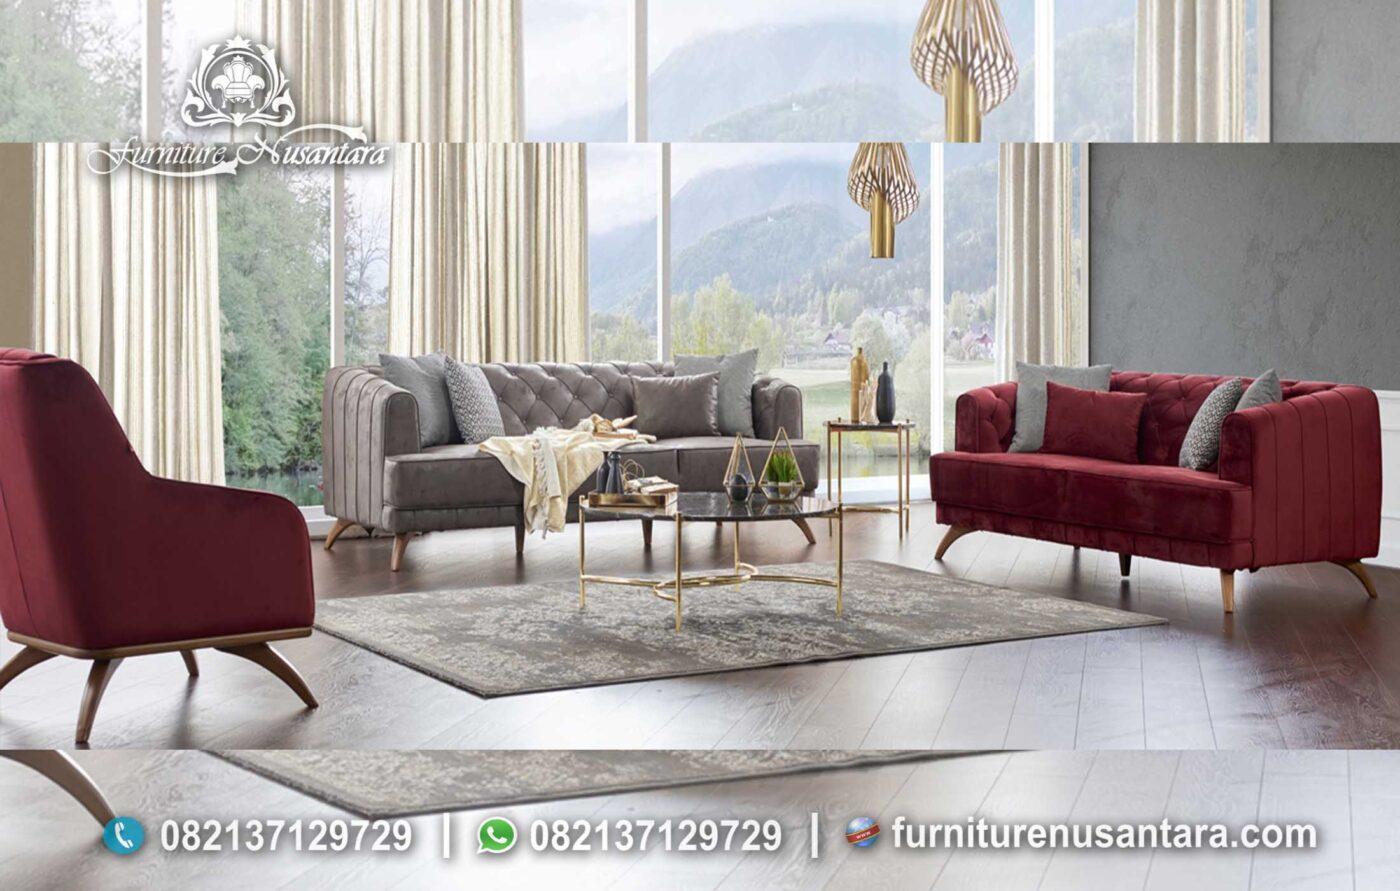 Kursi Sofa Minimalis Merah ST-47, Furniture Nusantara